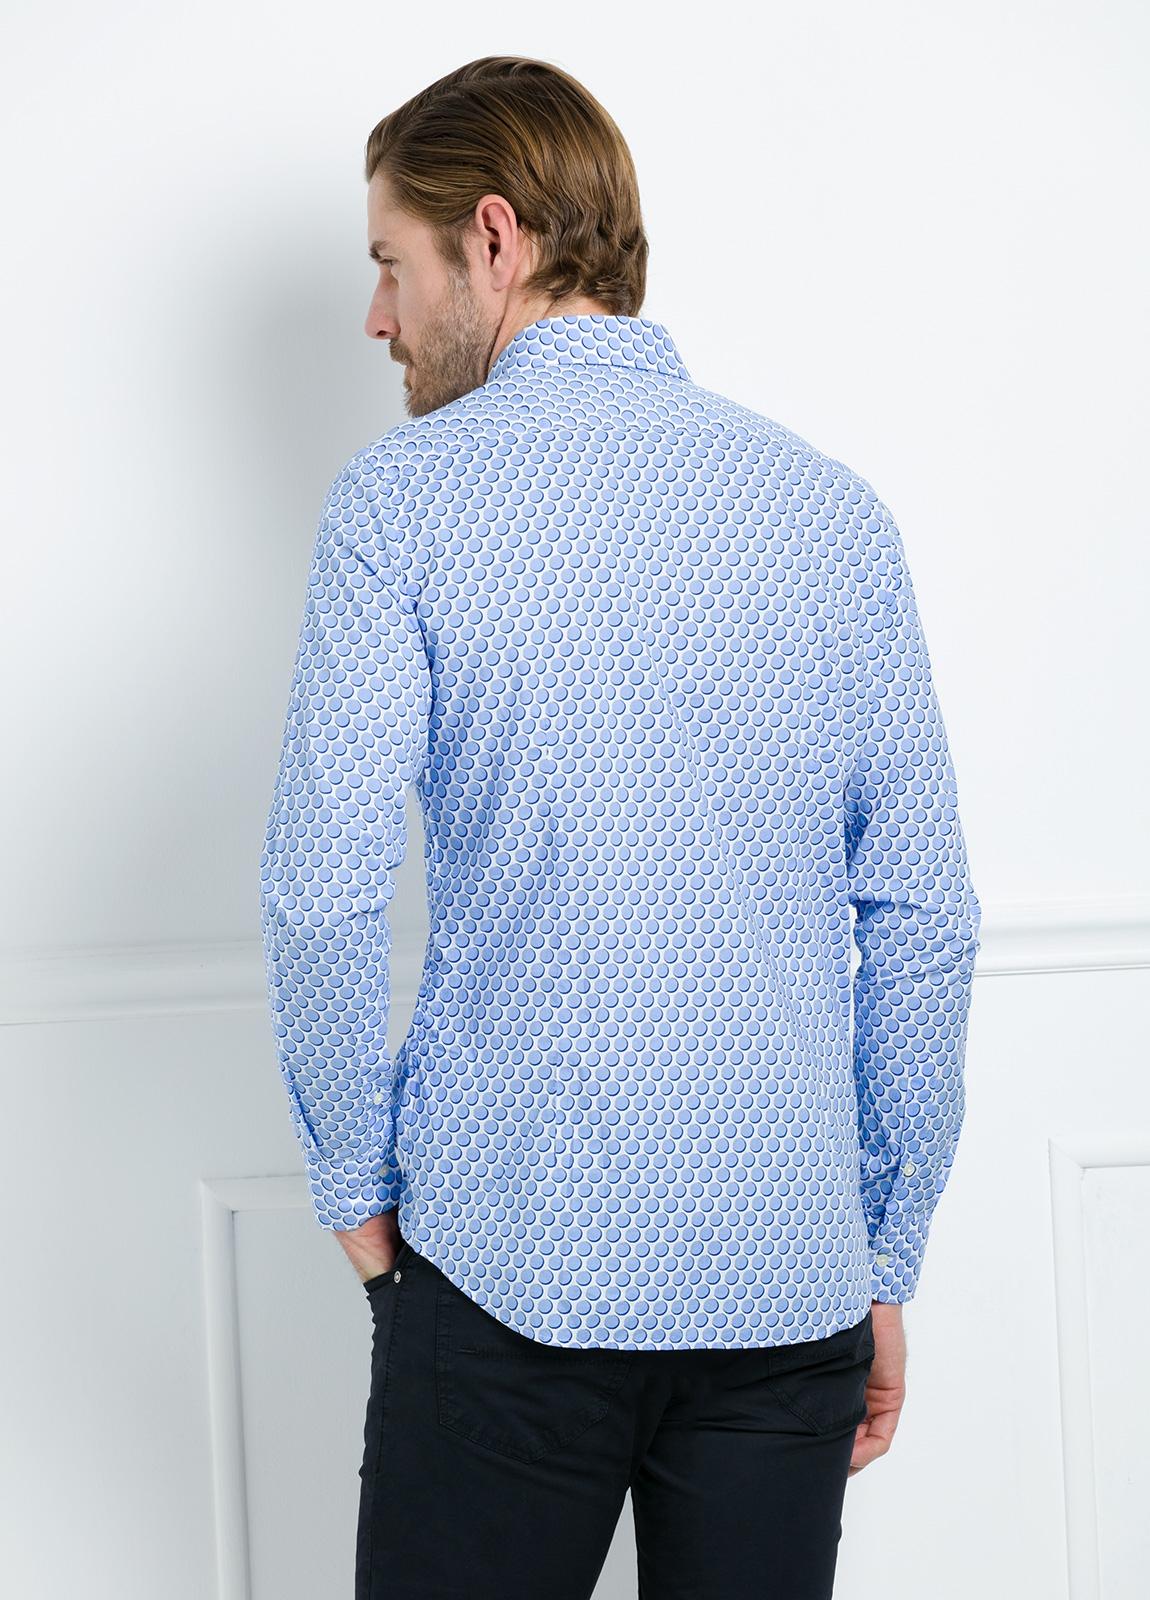 Camisa Casual Wear SLIM FIT Modelo CAPRI maxi dibujo lunar color azul. 100% Algodón. - Ítem3